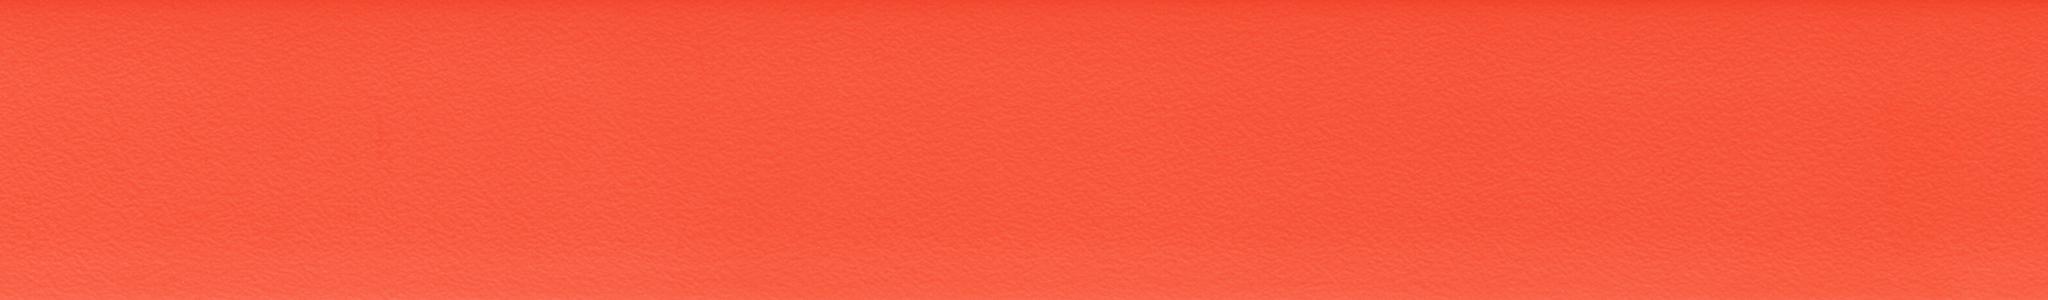 HU 13328 ABS Kante UNI Rot soft perl XG